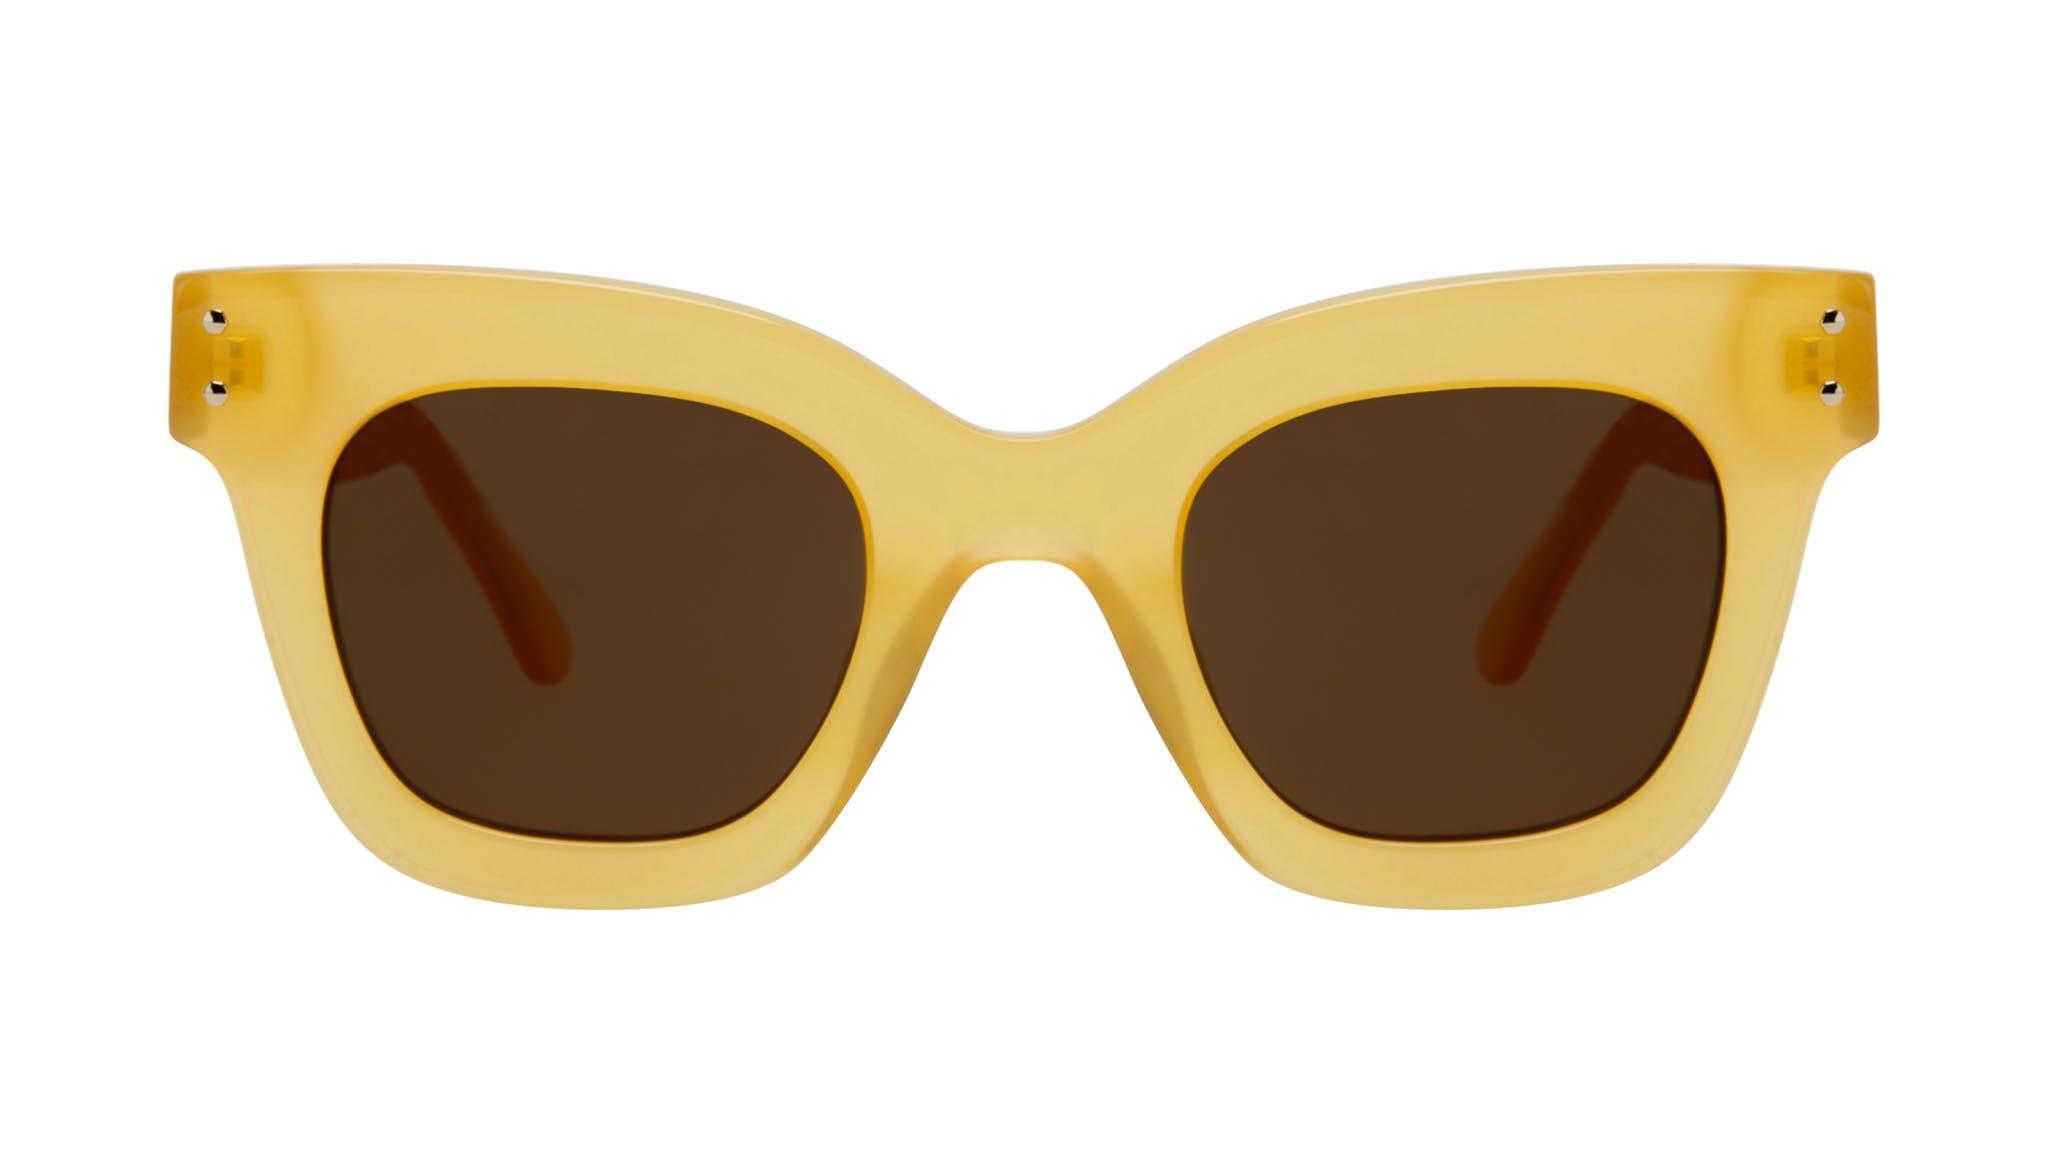 Affordable Fashion Glasses Square Sunglasses Women Fever Lemon